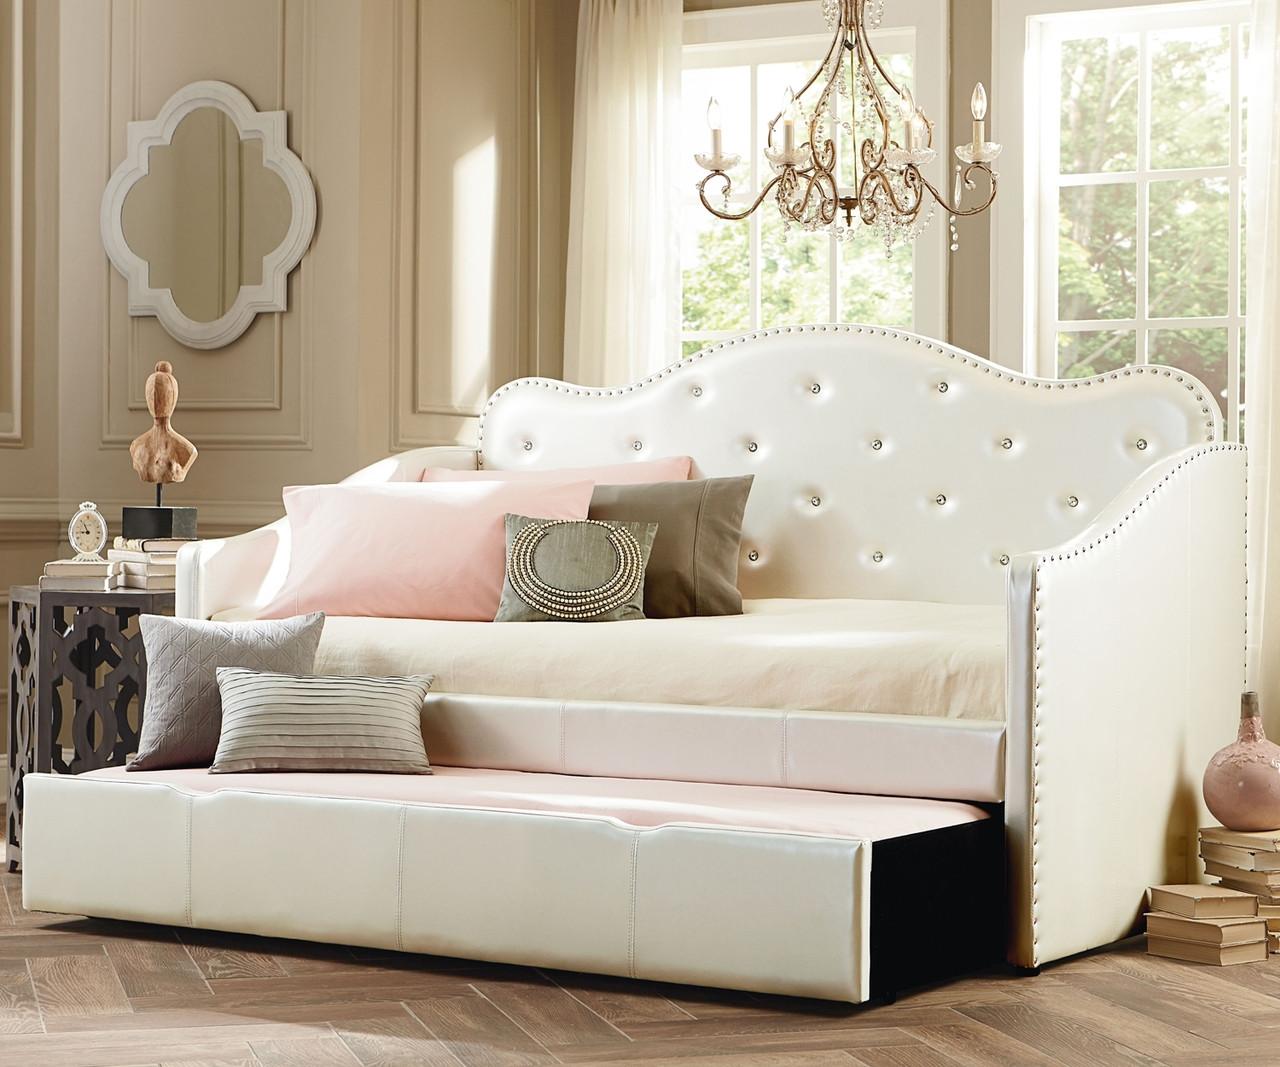 Caroline Daybed With Trundle In Upholstered White 98150 Standard Furniture Girls Bedroom Set